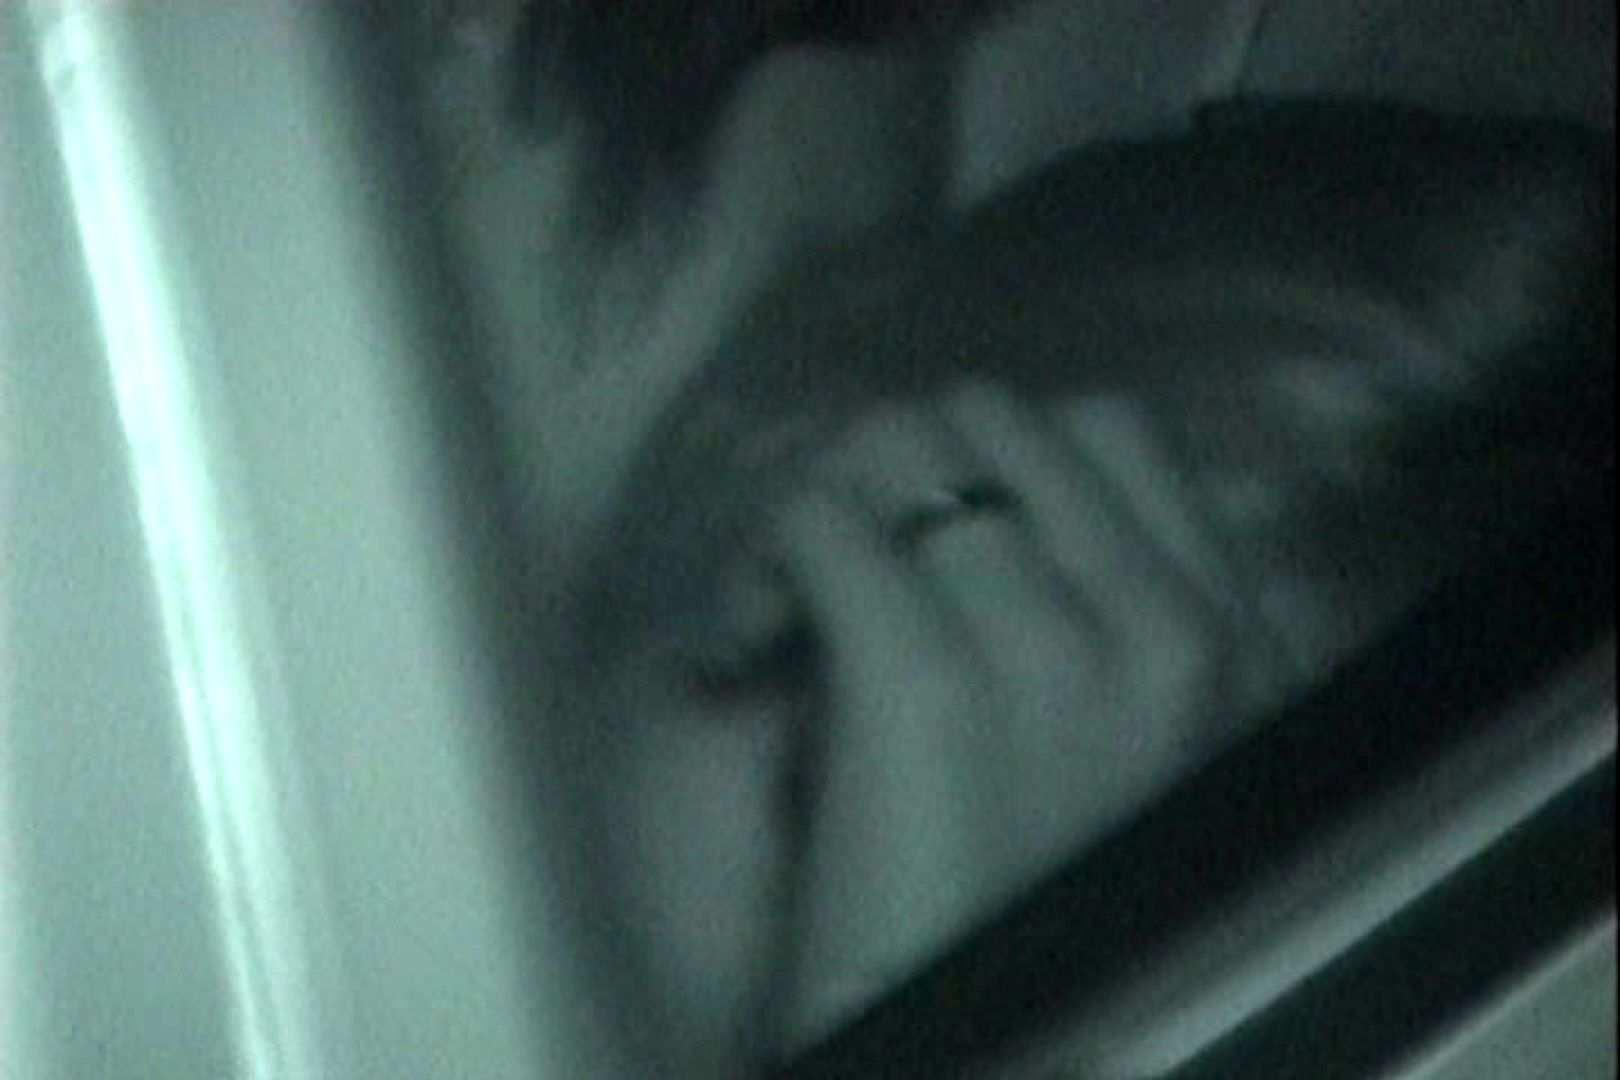 充血監督の深夜の運動会Vol.144 美女OL  46連発 3